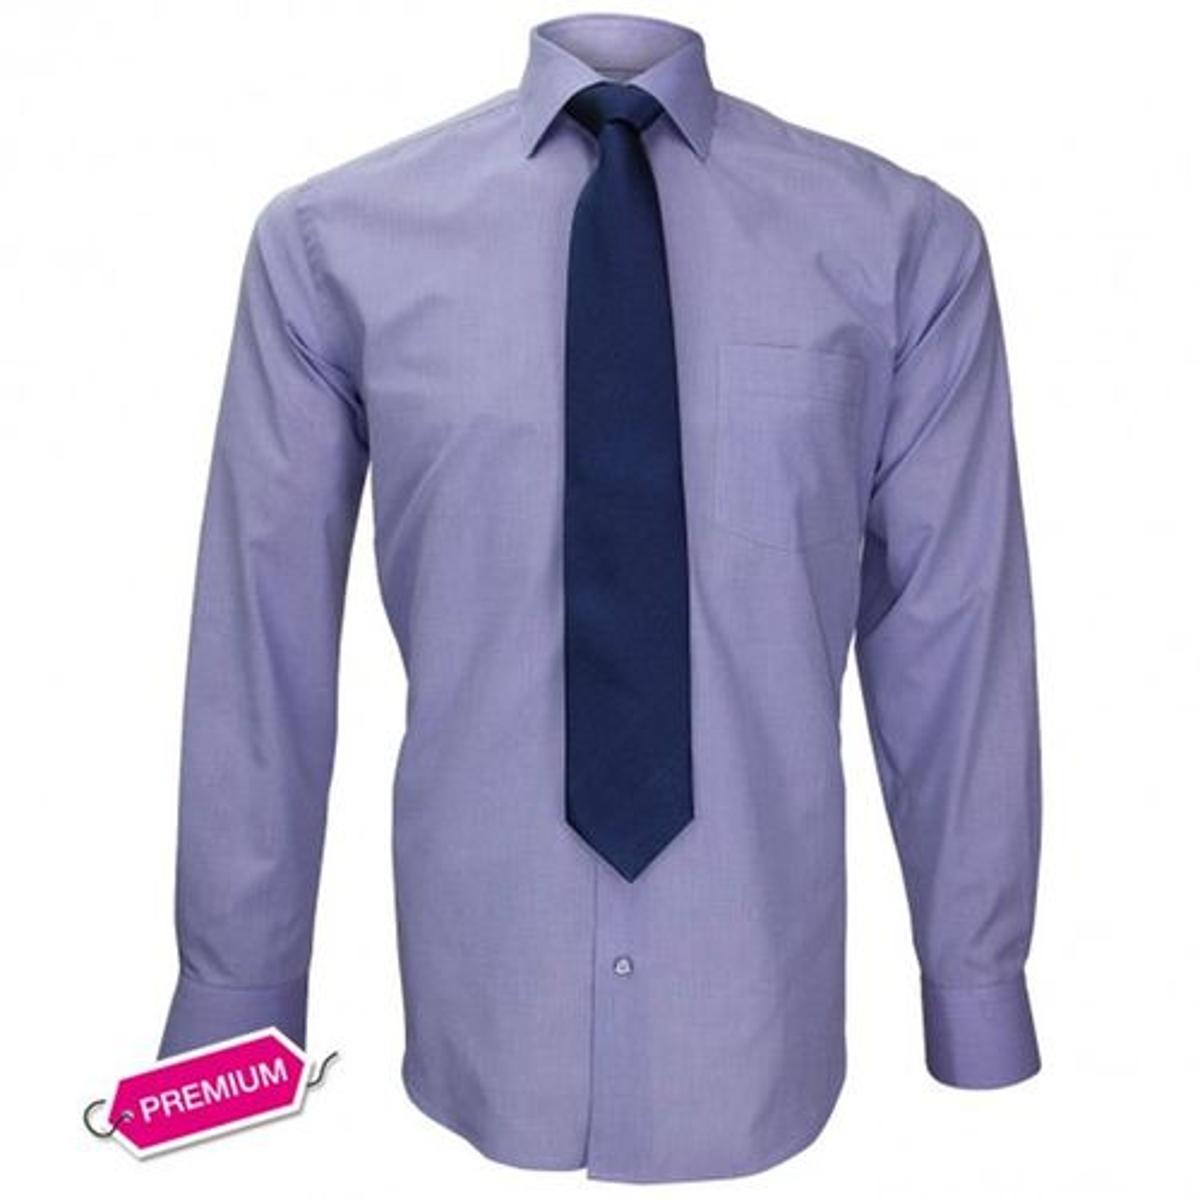 chemise premium classique- fil a fil